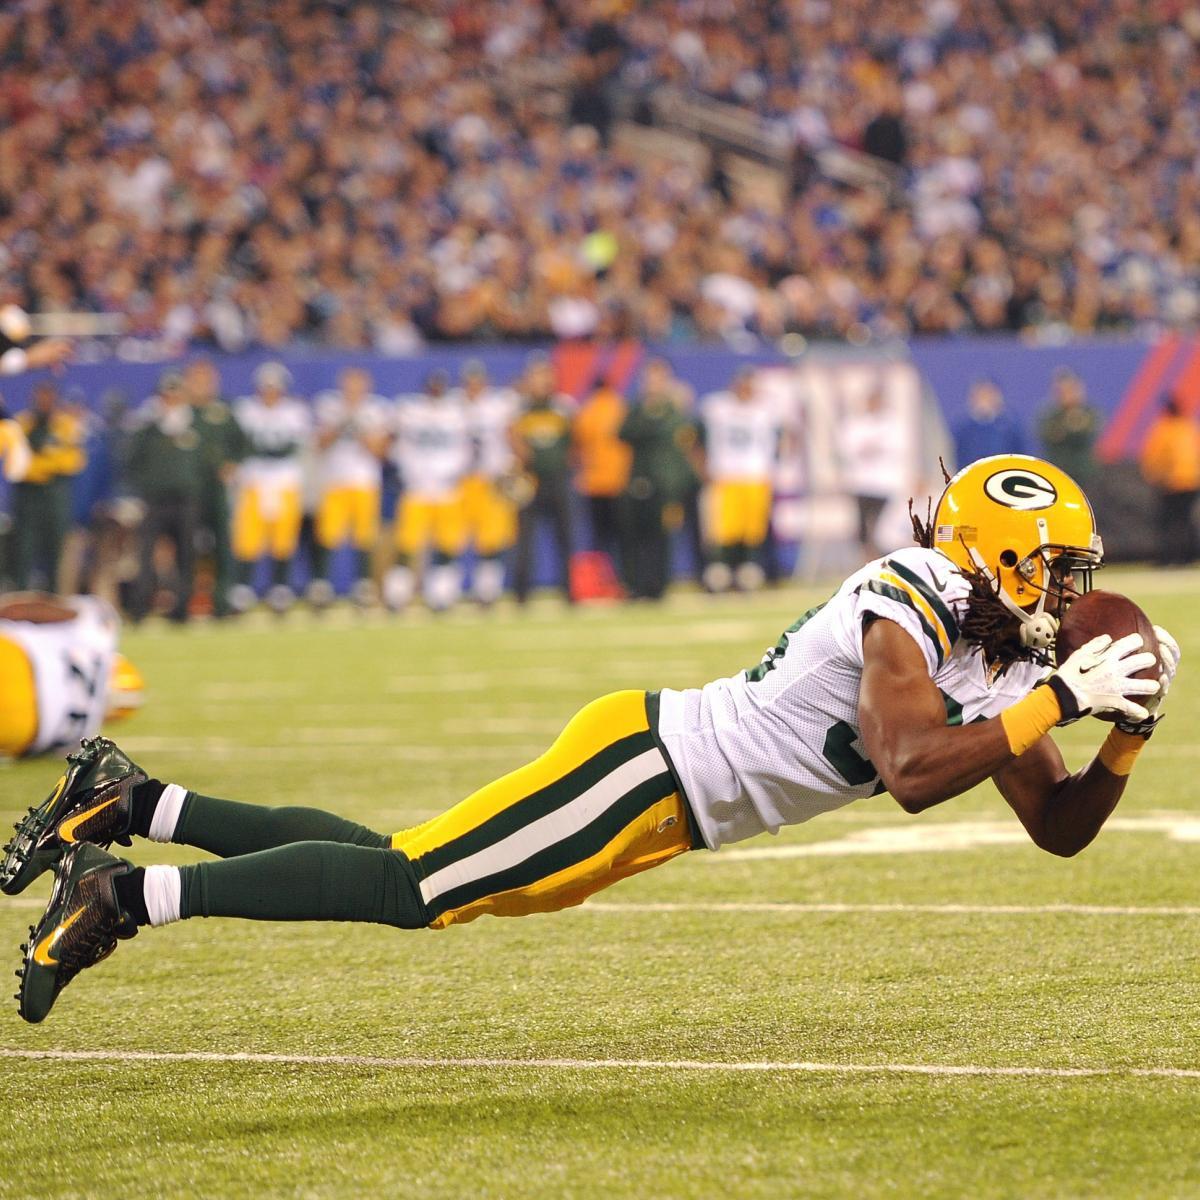 Week 11 Giants Vs Packers: Packers Vs. Giants: Full Roster Report Card Grades For